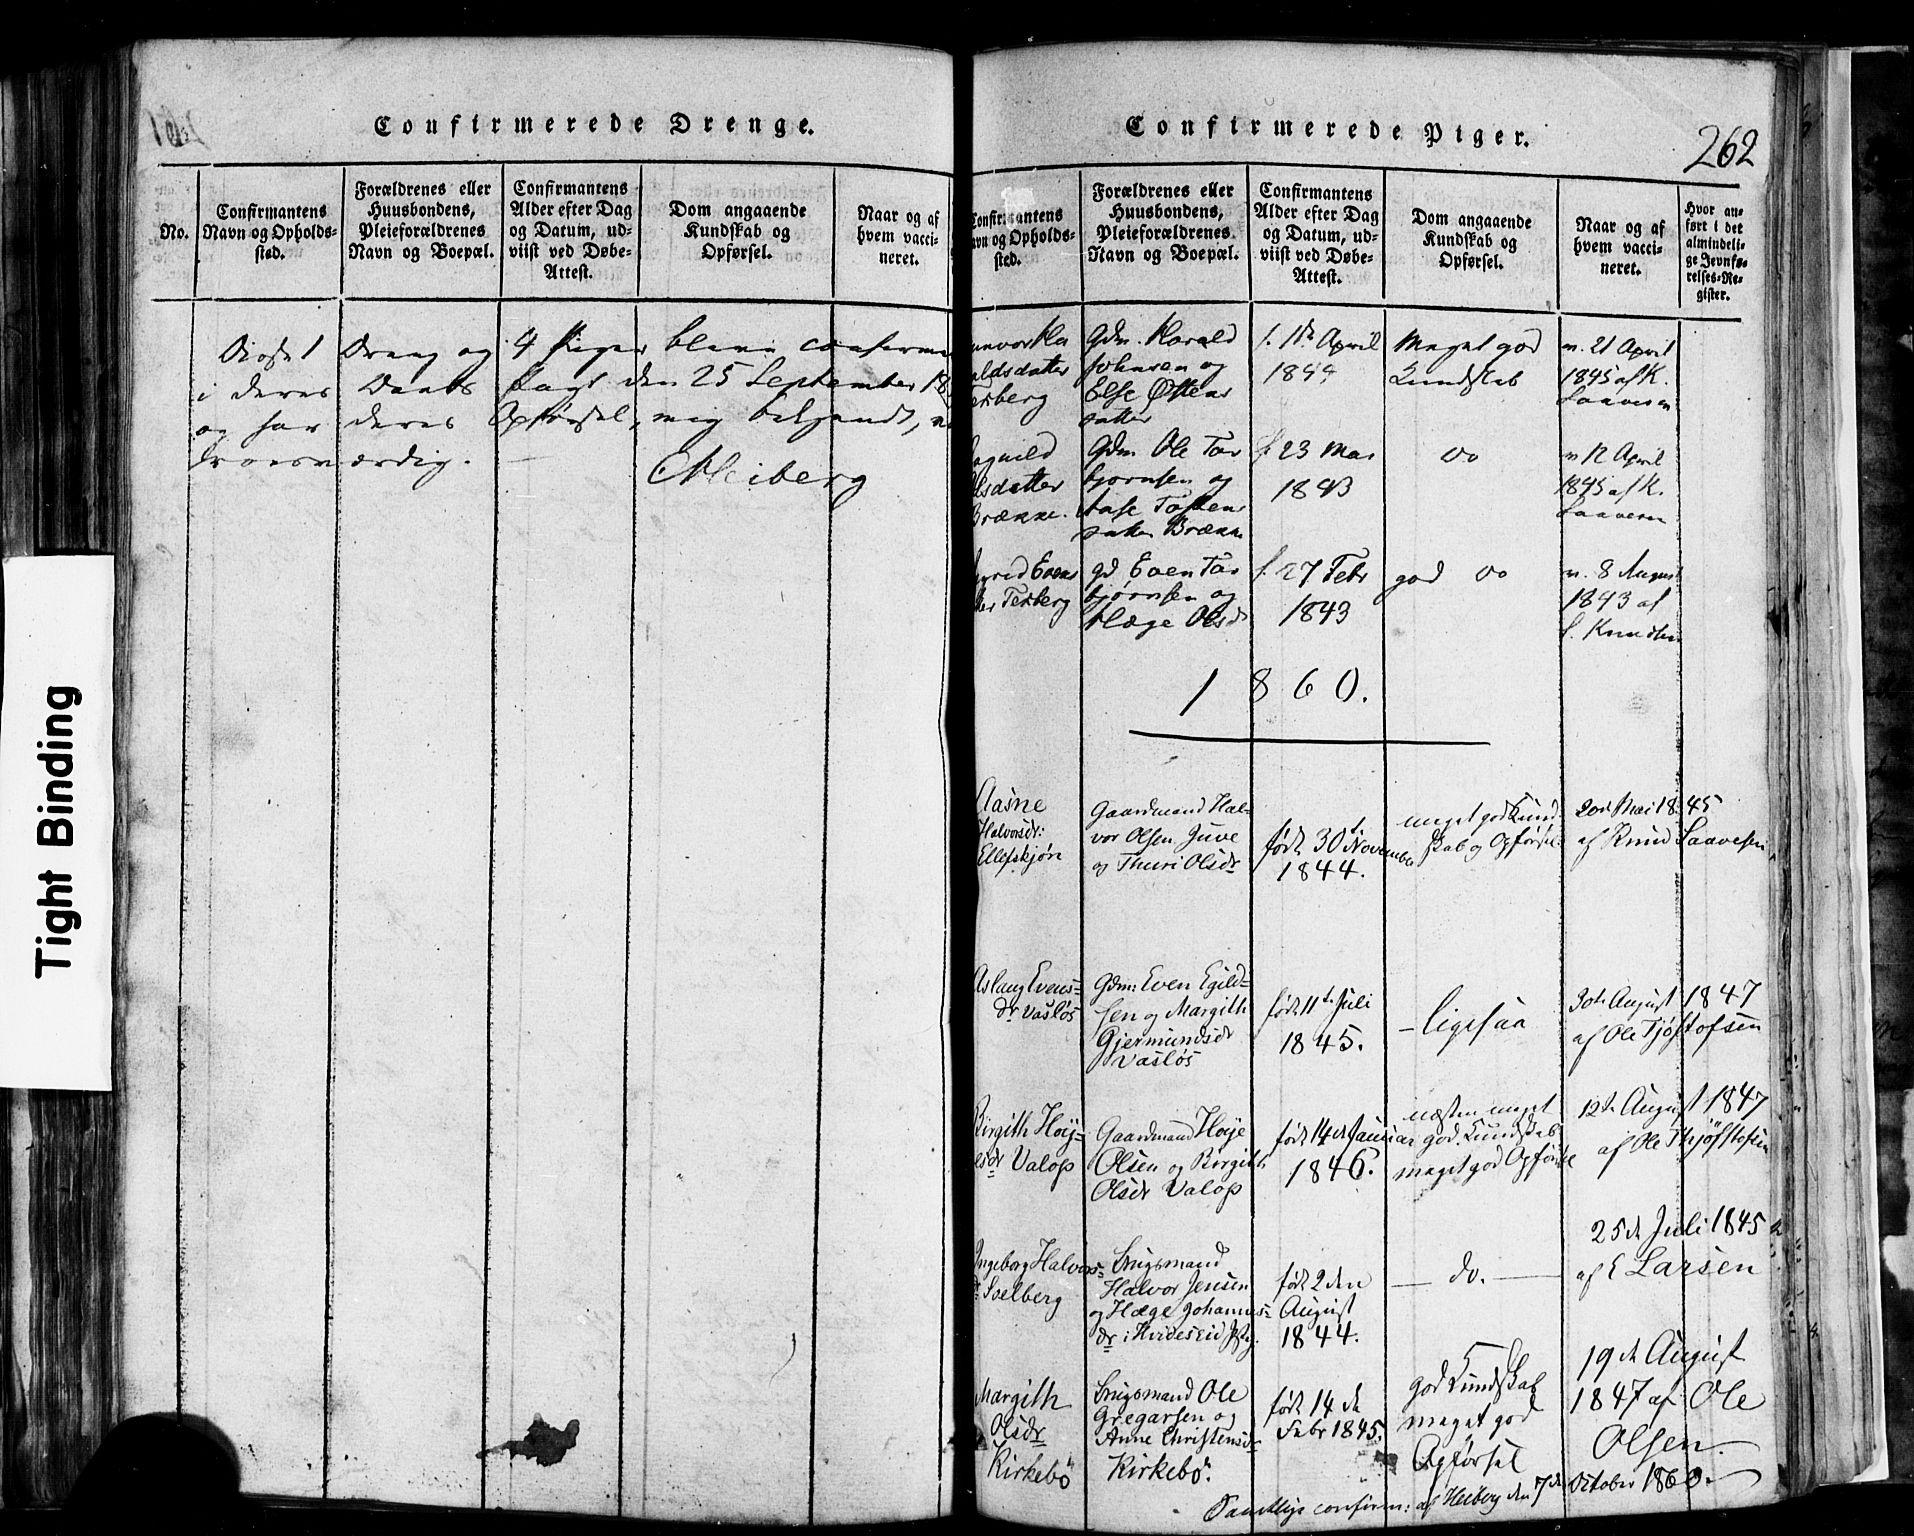 SAKO, Rauland kirkebøker, F/Fa/L0002: Ministerialbok nr. 2, 1815-1860, s. 262